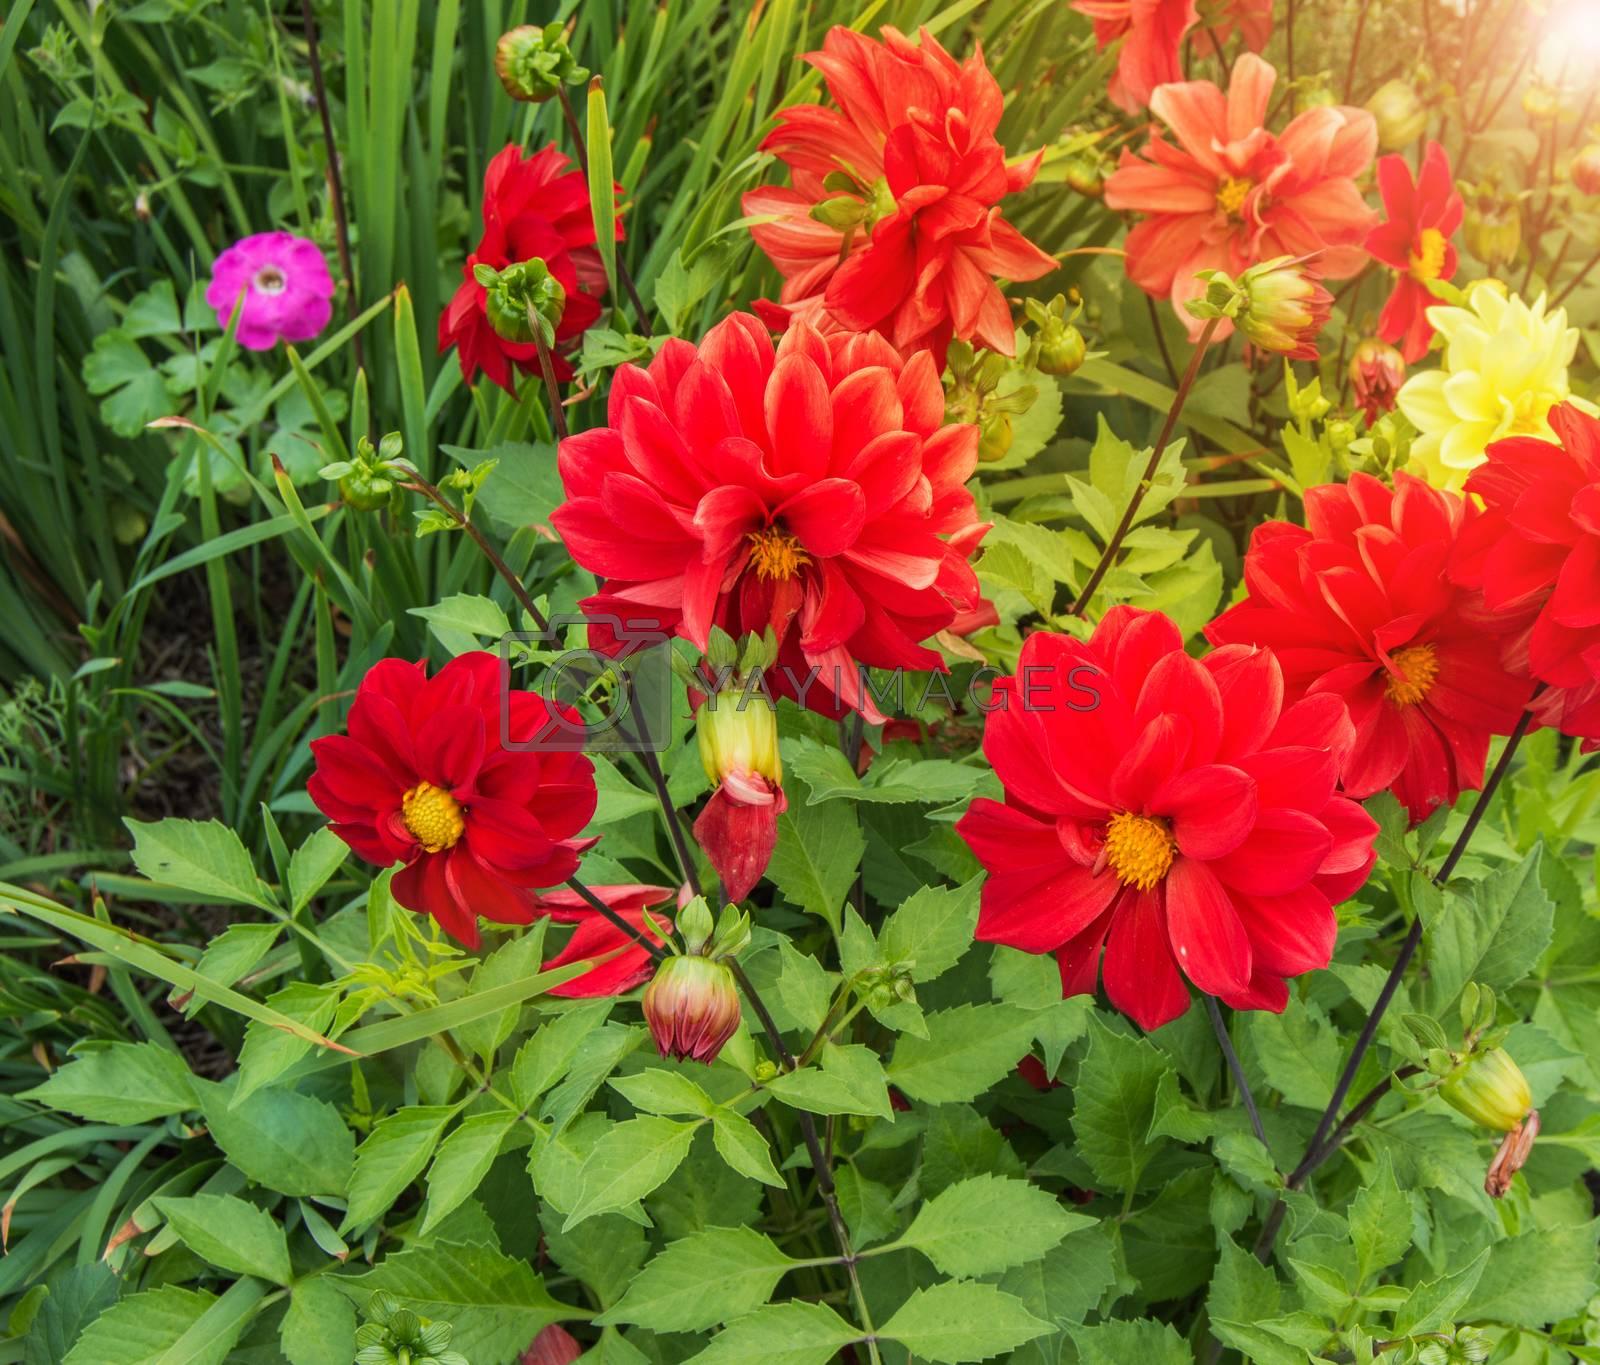 Red dahlias in the garden, bright sunlight, outdoors, nobody.